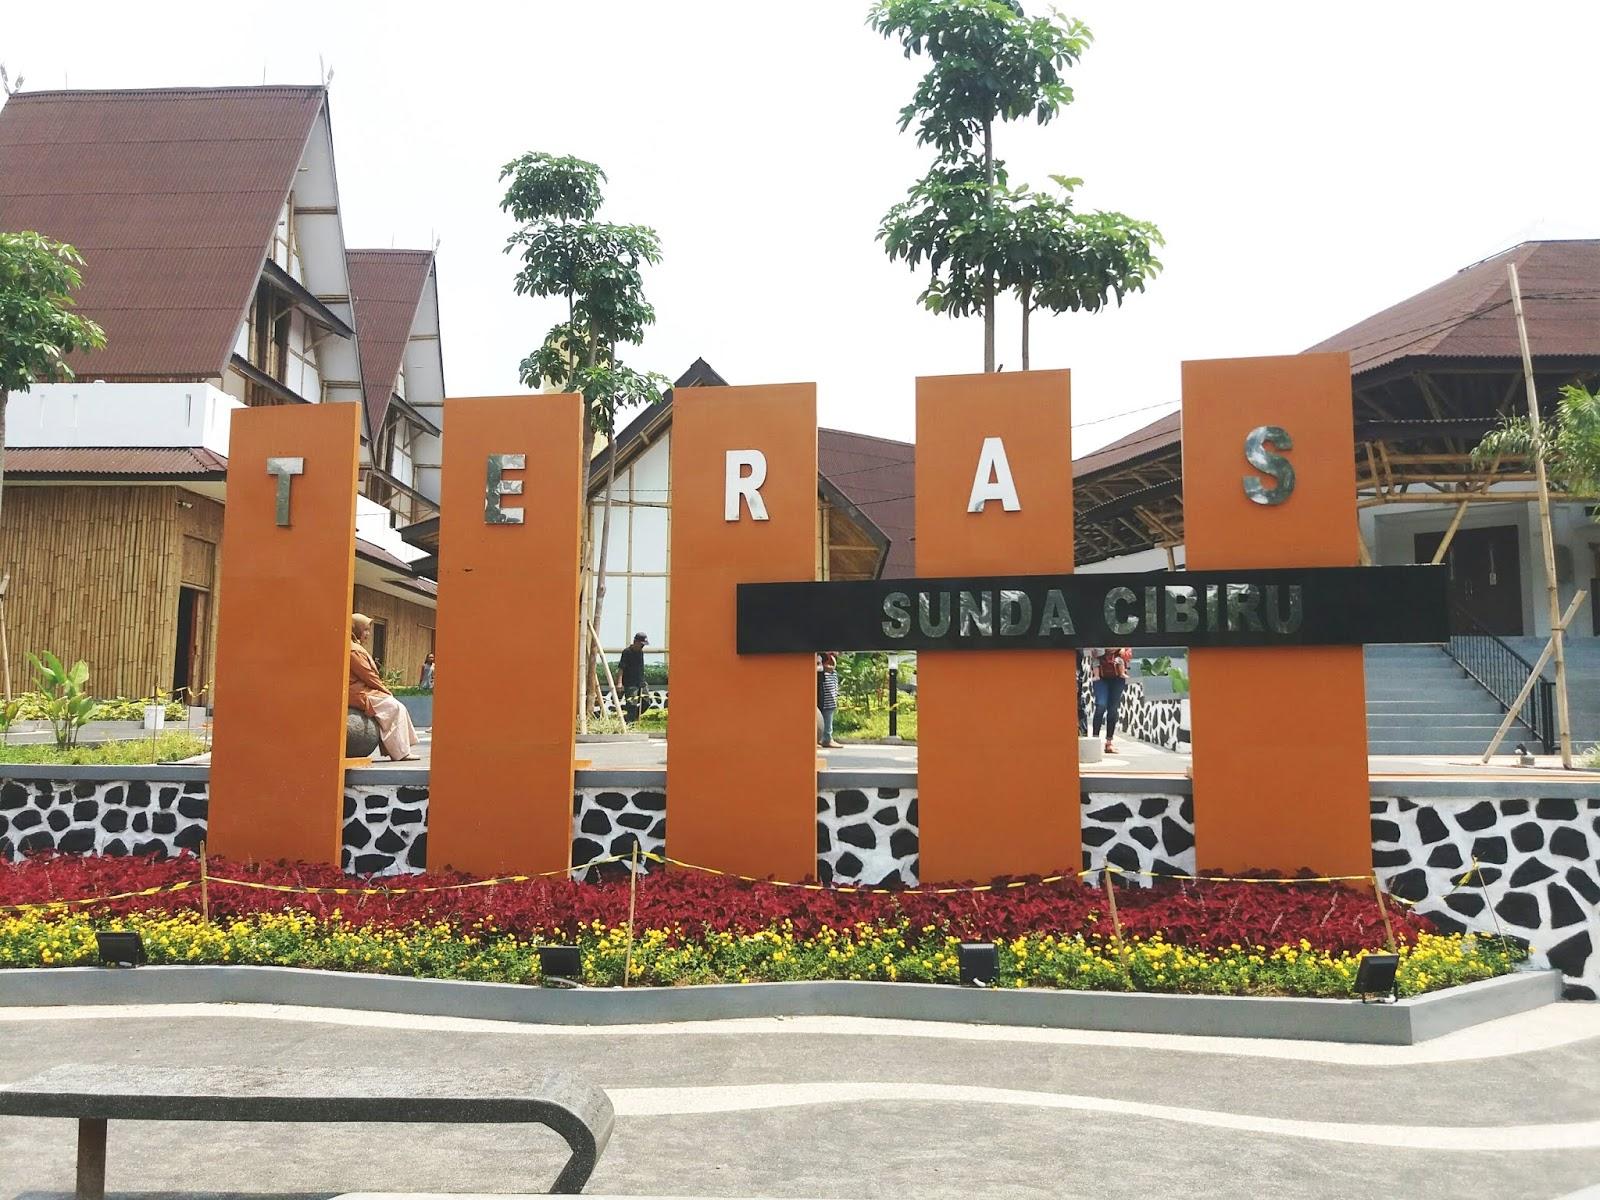 Teras Sunda Cibiru